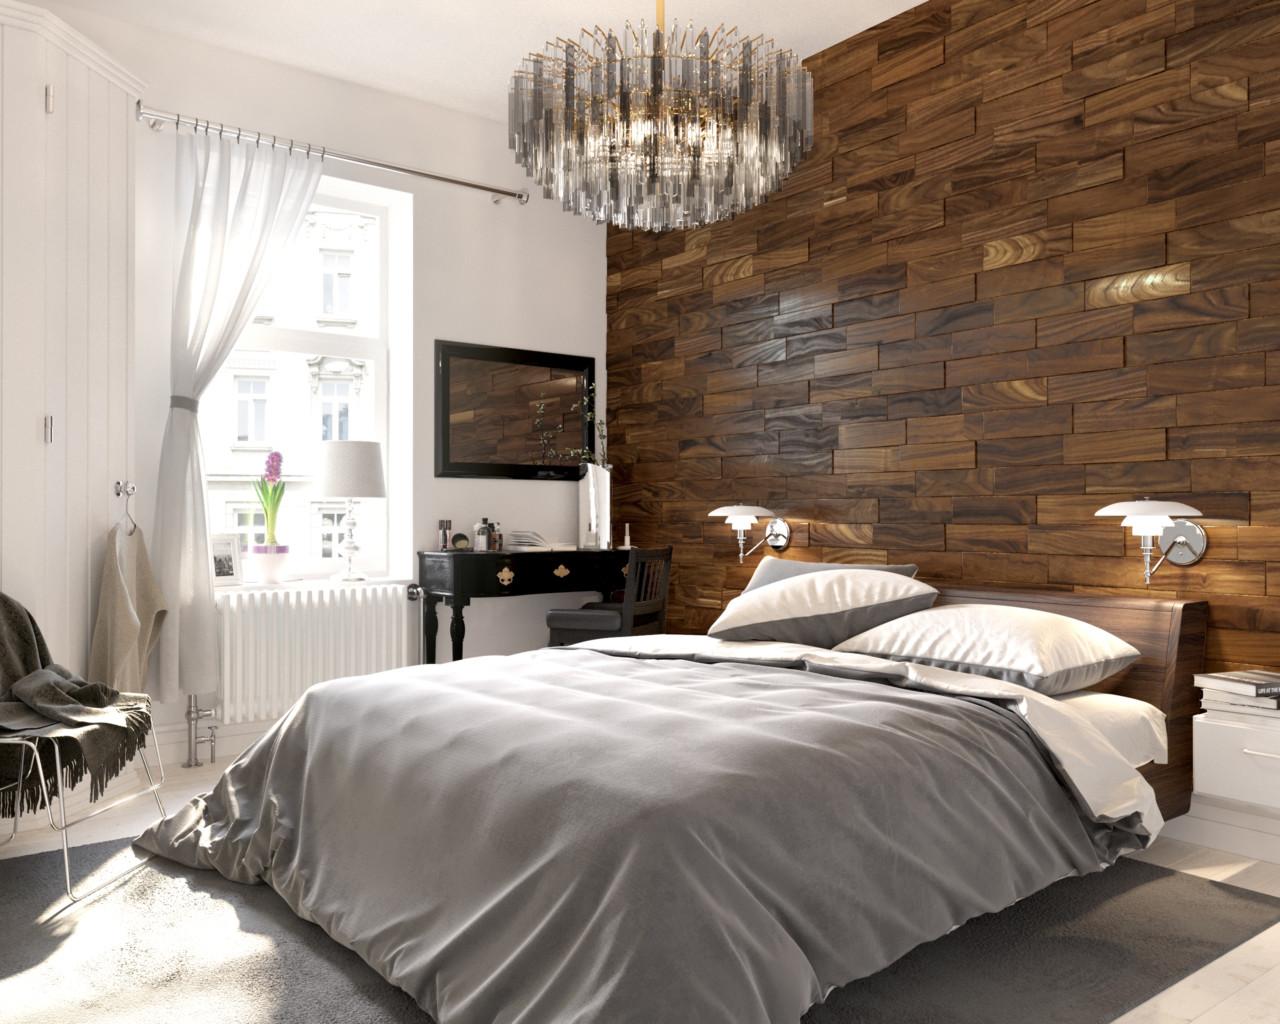 Wood Paneling - Wood Wall Paneling - Real Wood Paneling ...